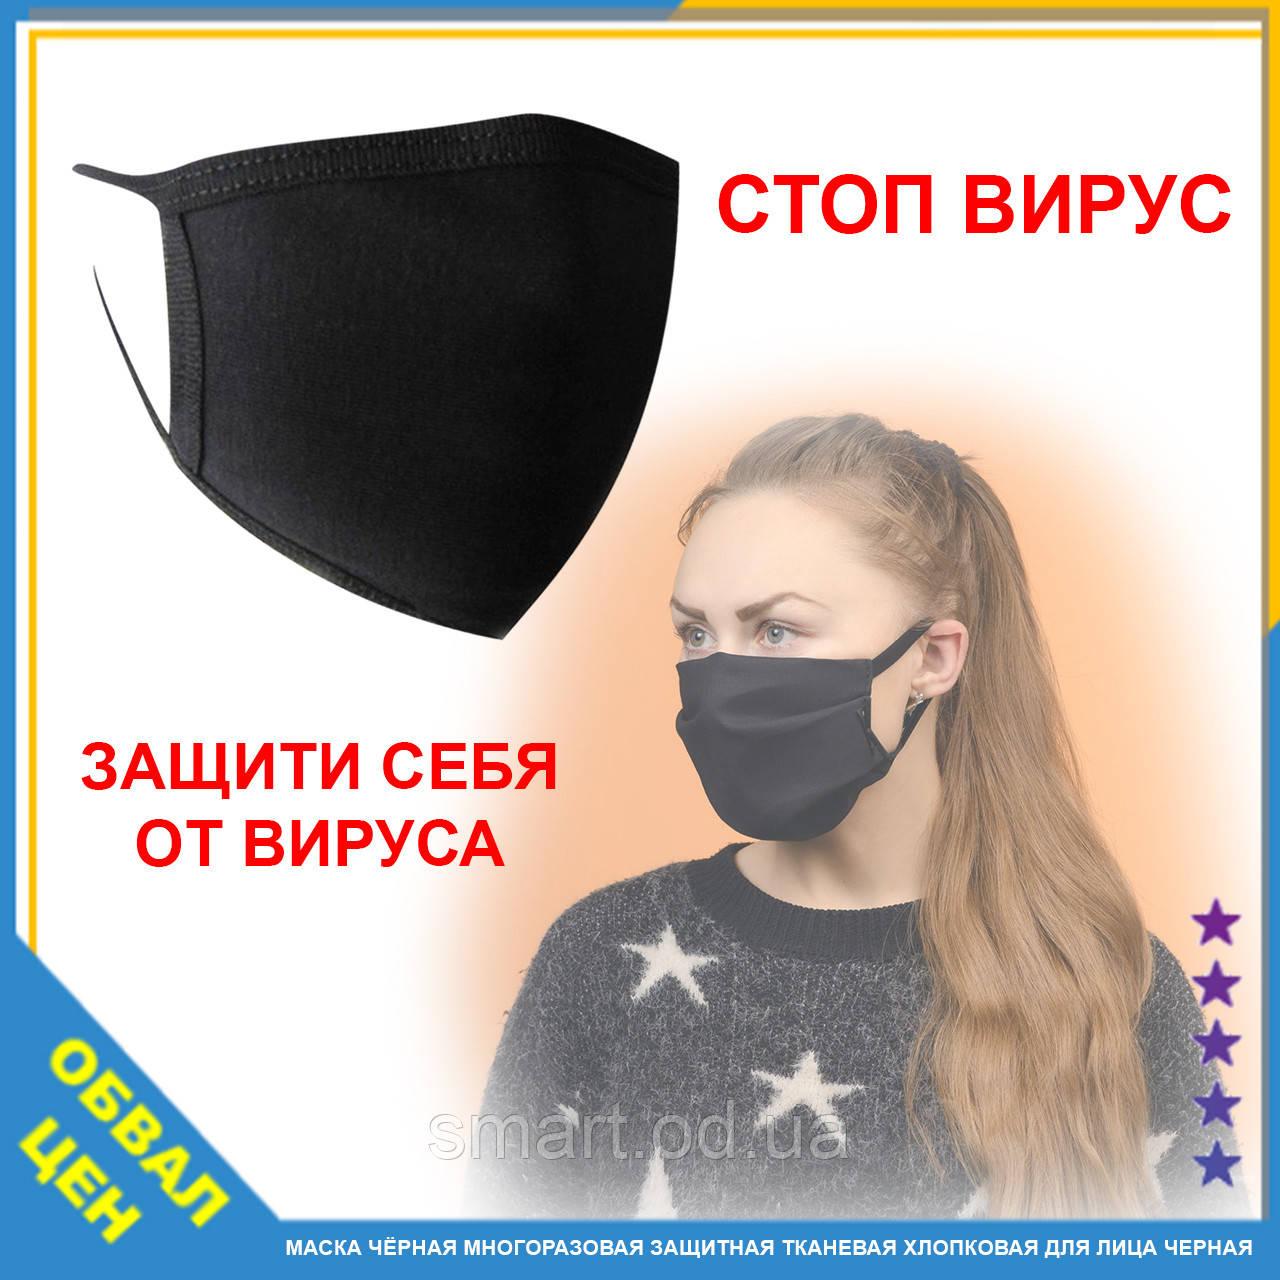 Маска чёрная многоразовая защитная тканевая хлопковая для лица черная black mask противовирусная FFP-2 FFP 2